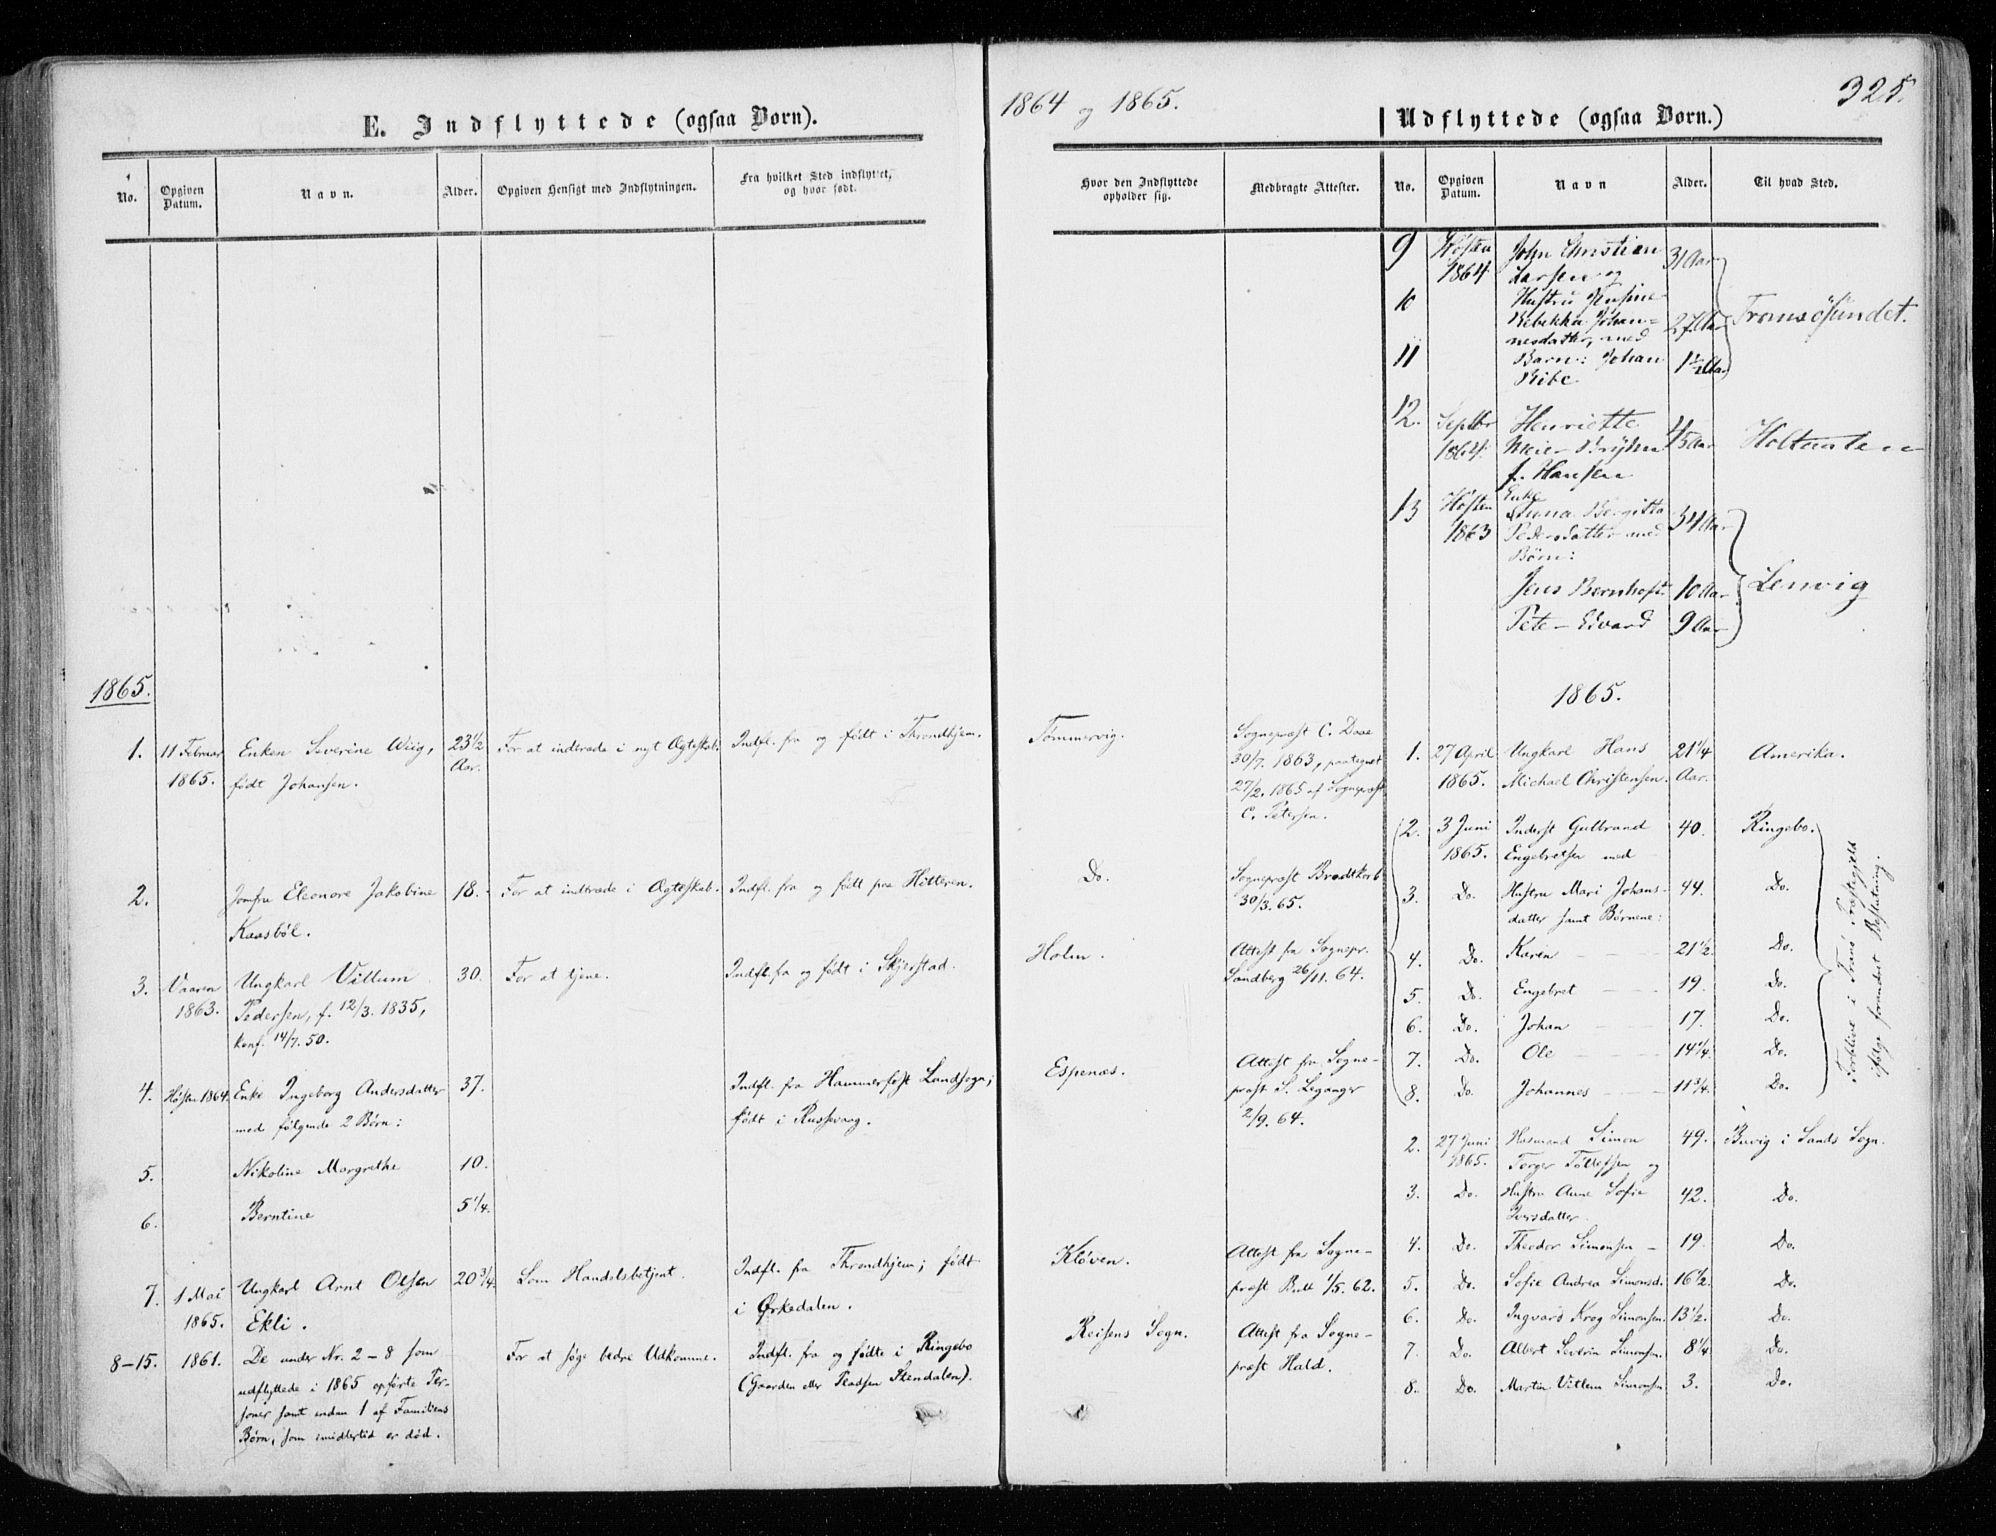 SATØ, Tranøy sokneprestkontor, I/Ia/Iaa/L0007kirke: Ministerialbok nr. 7, 1856-1866, s. 325